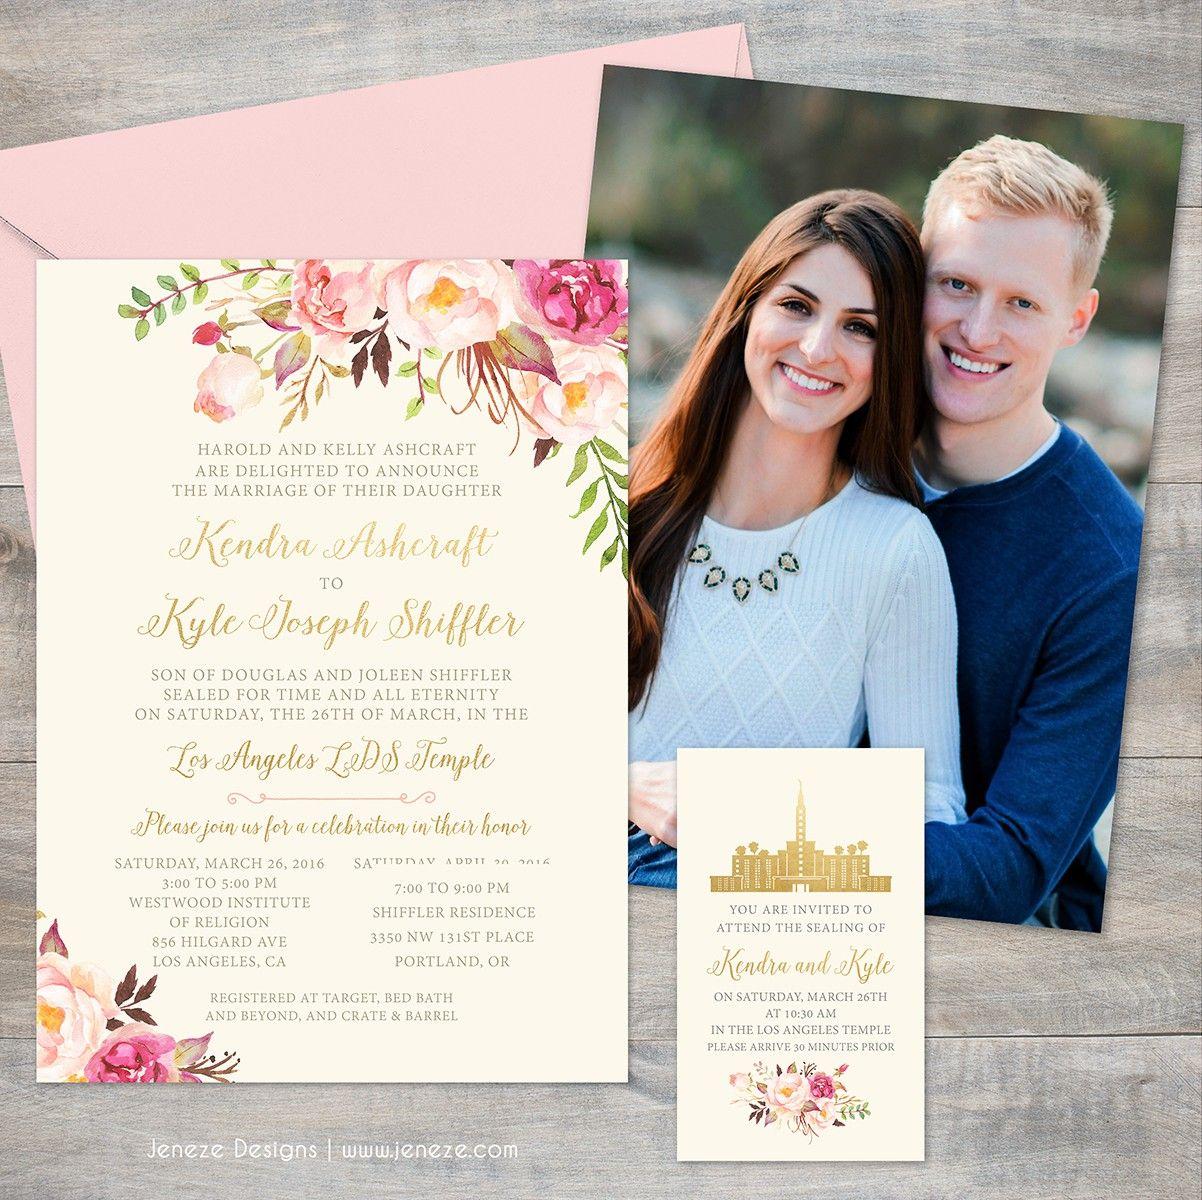 Custom Boho Spring Wedding Invitations With Cream Blush Pink And